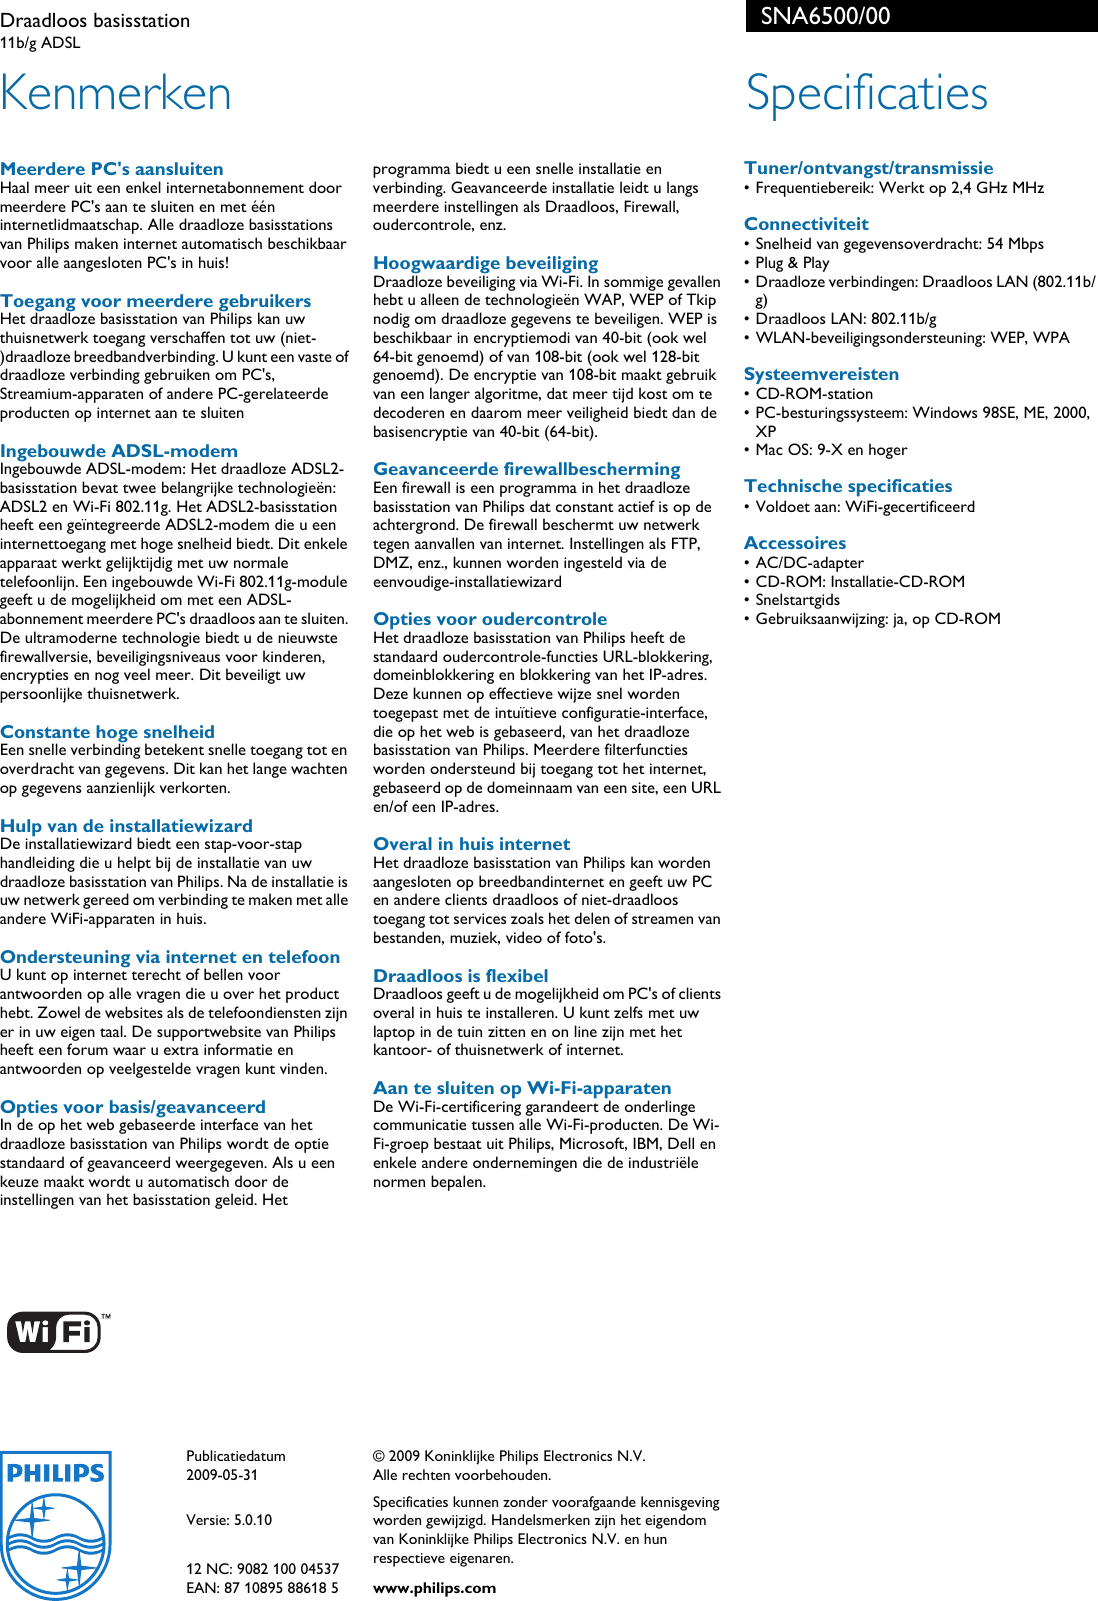 Philips SNA6500/00 Draadloos Basisstation User Manual